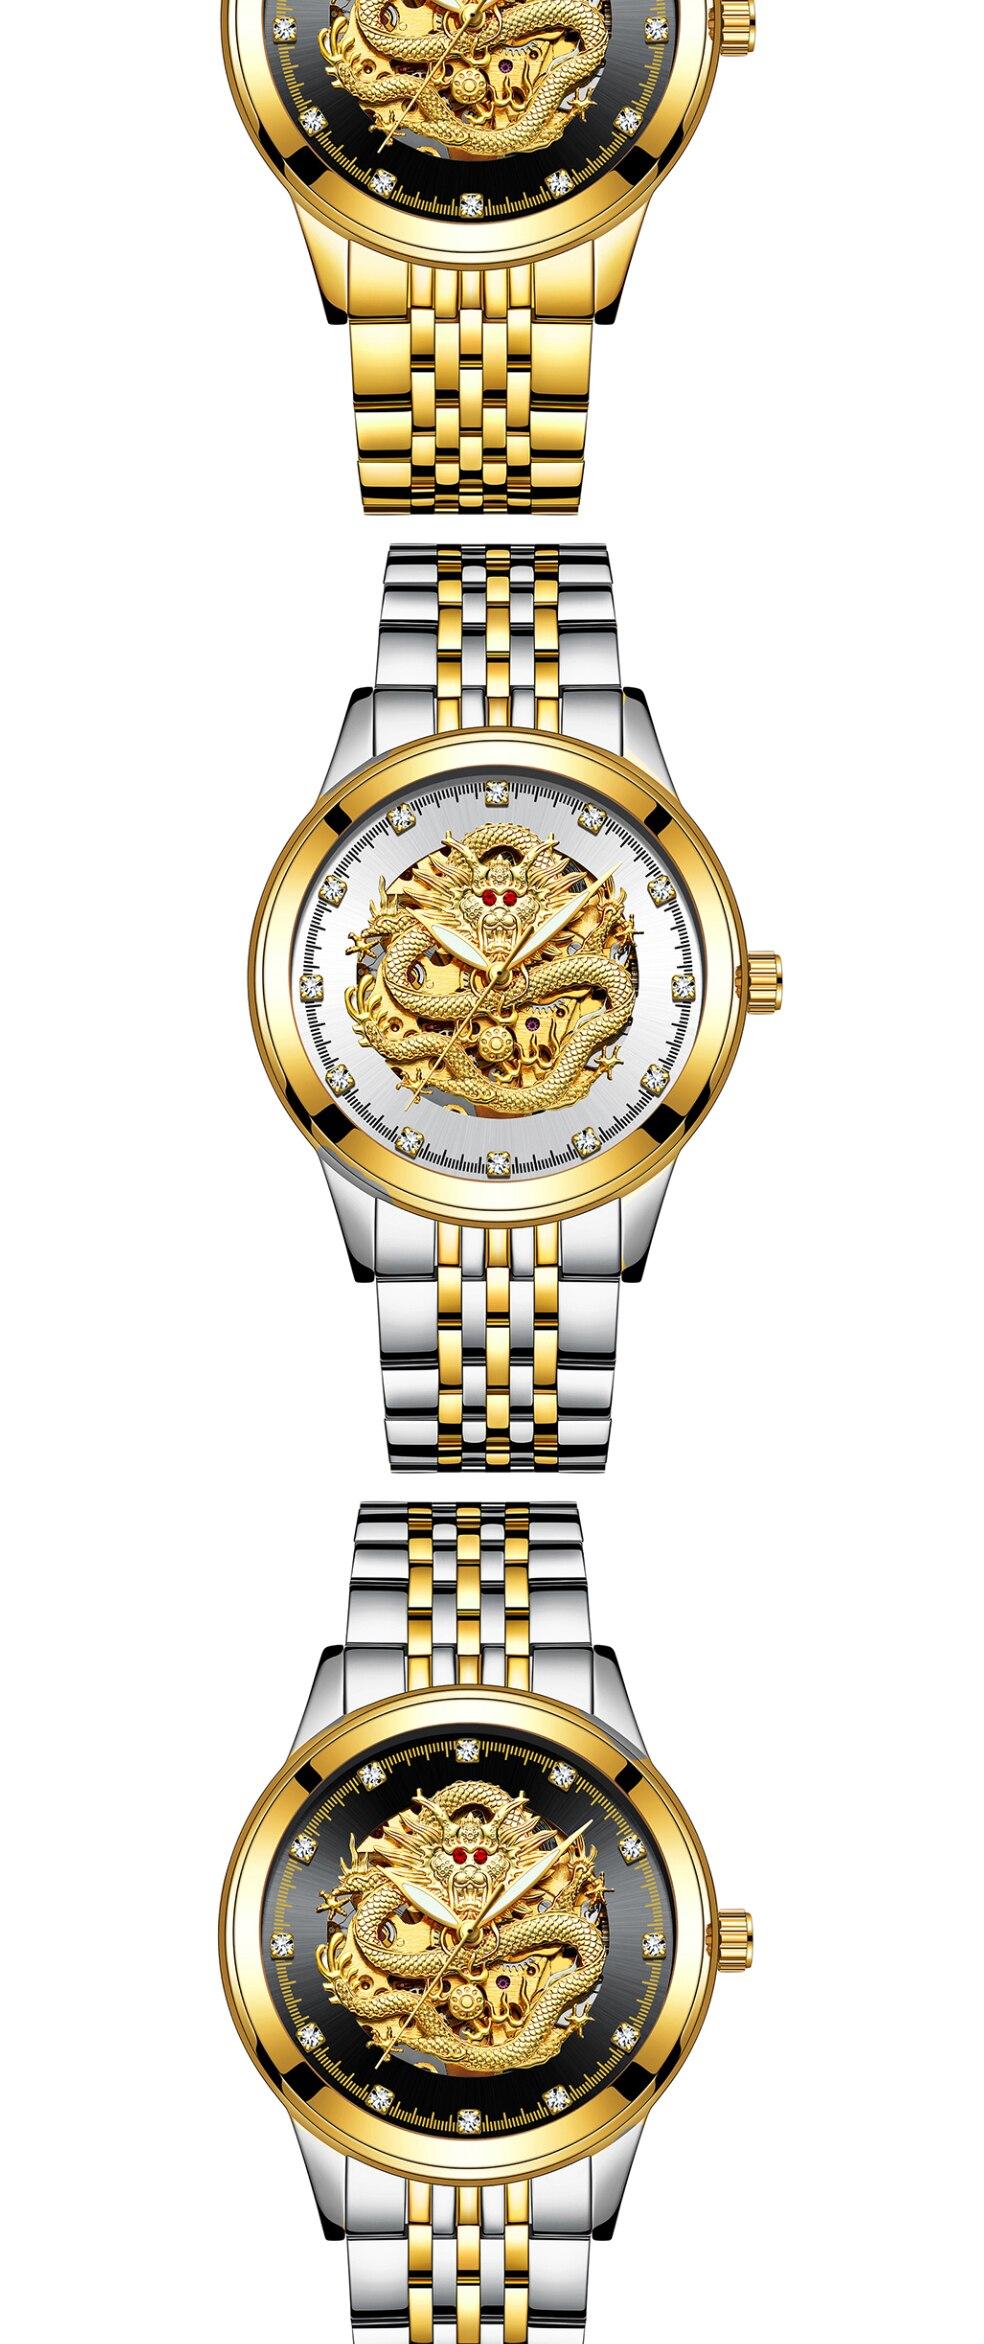 HTB1kUZYXoLrK1Rjy0Fjq6zYXFXat TEVISE Men Mechanical Watch Luxurious Automatic Winding Watches Waterproof Skeleton Hollow Gold Dragon Clock Relogio Masculino